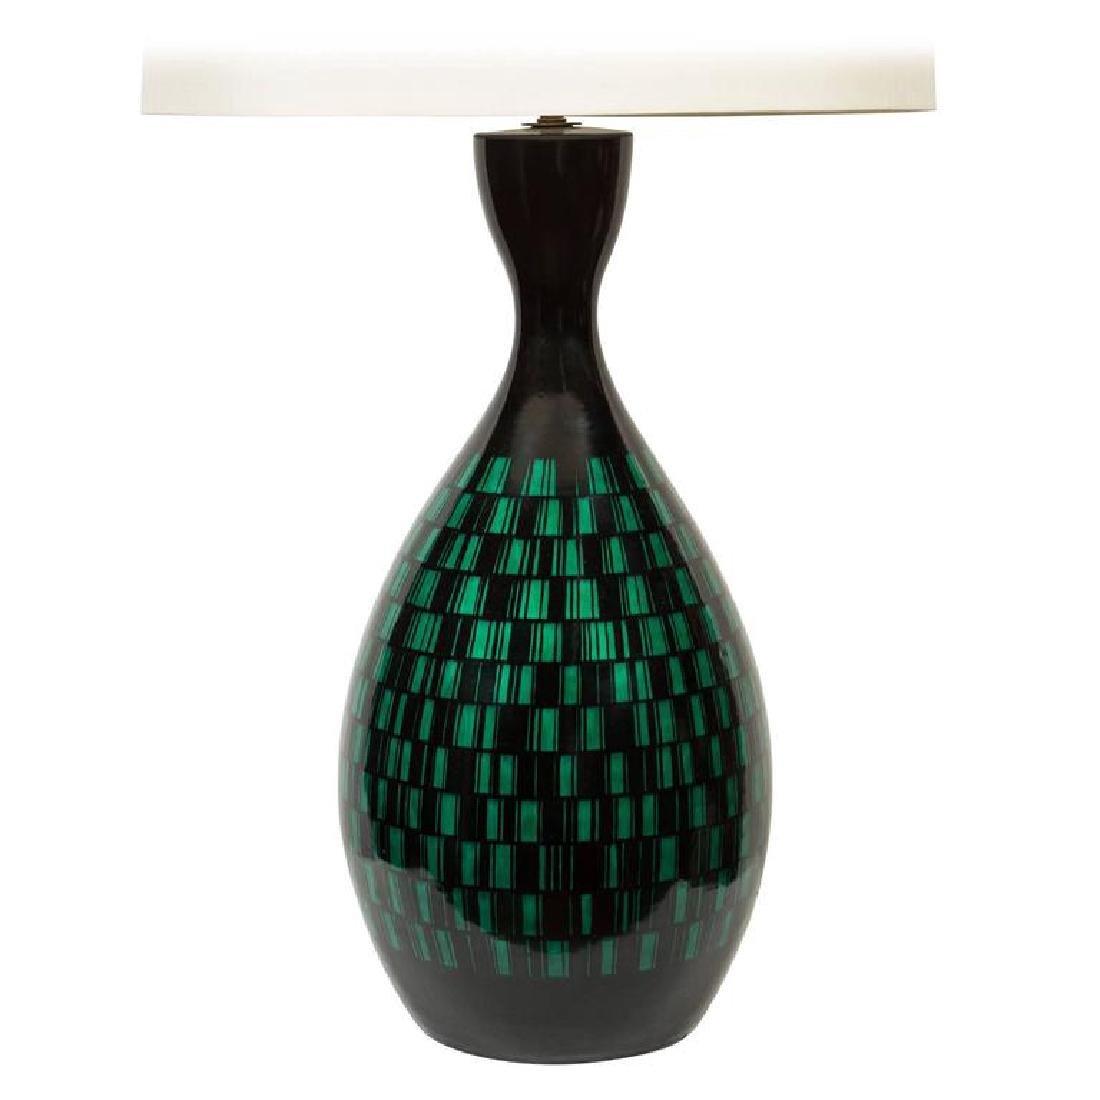 Ettorre Sottsass Table Lamp